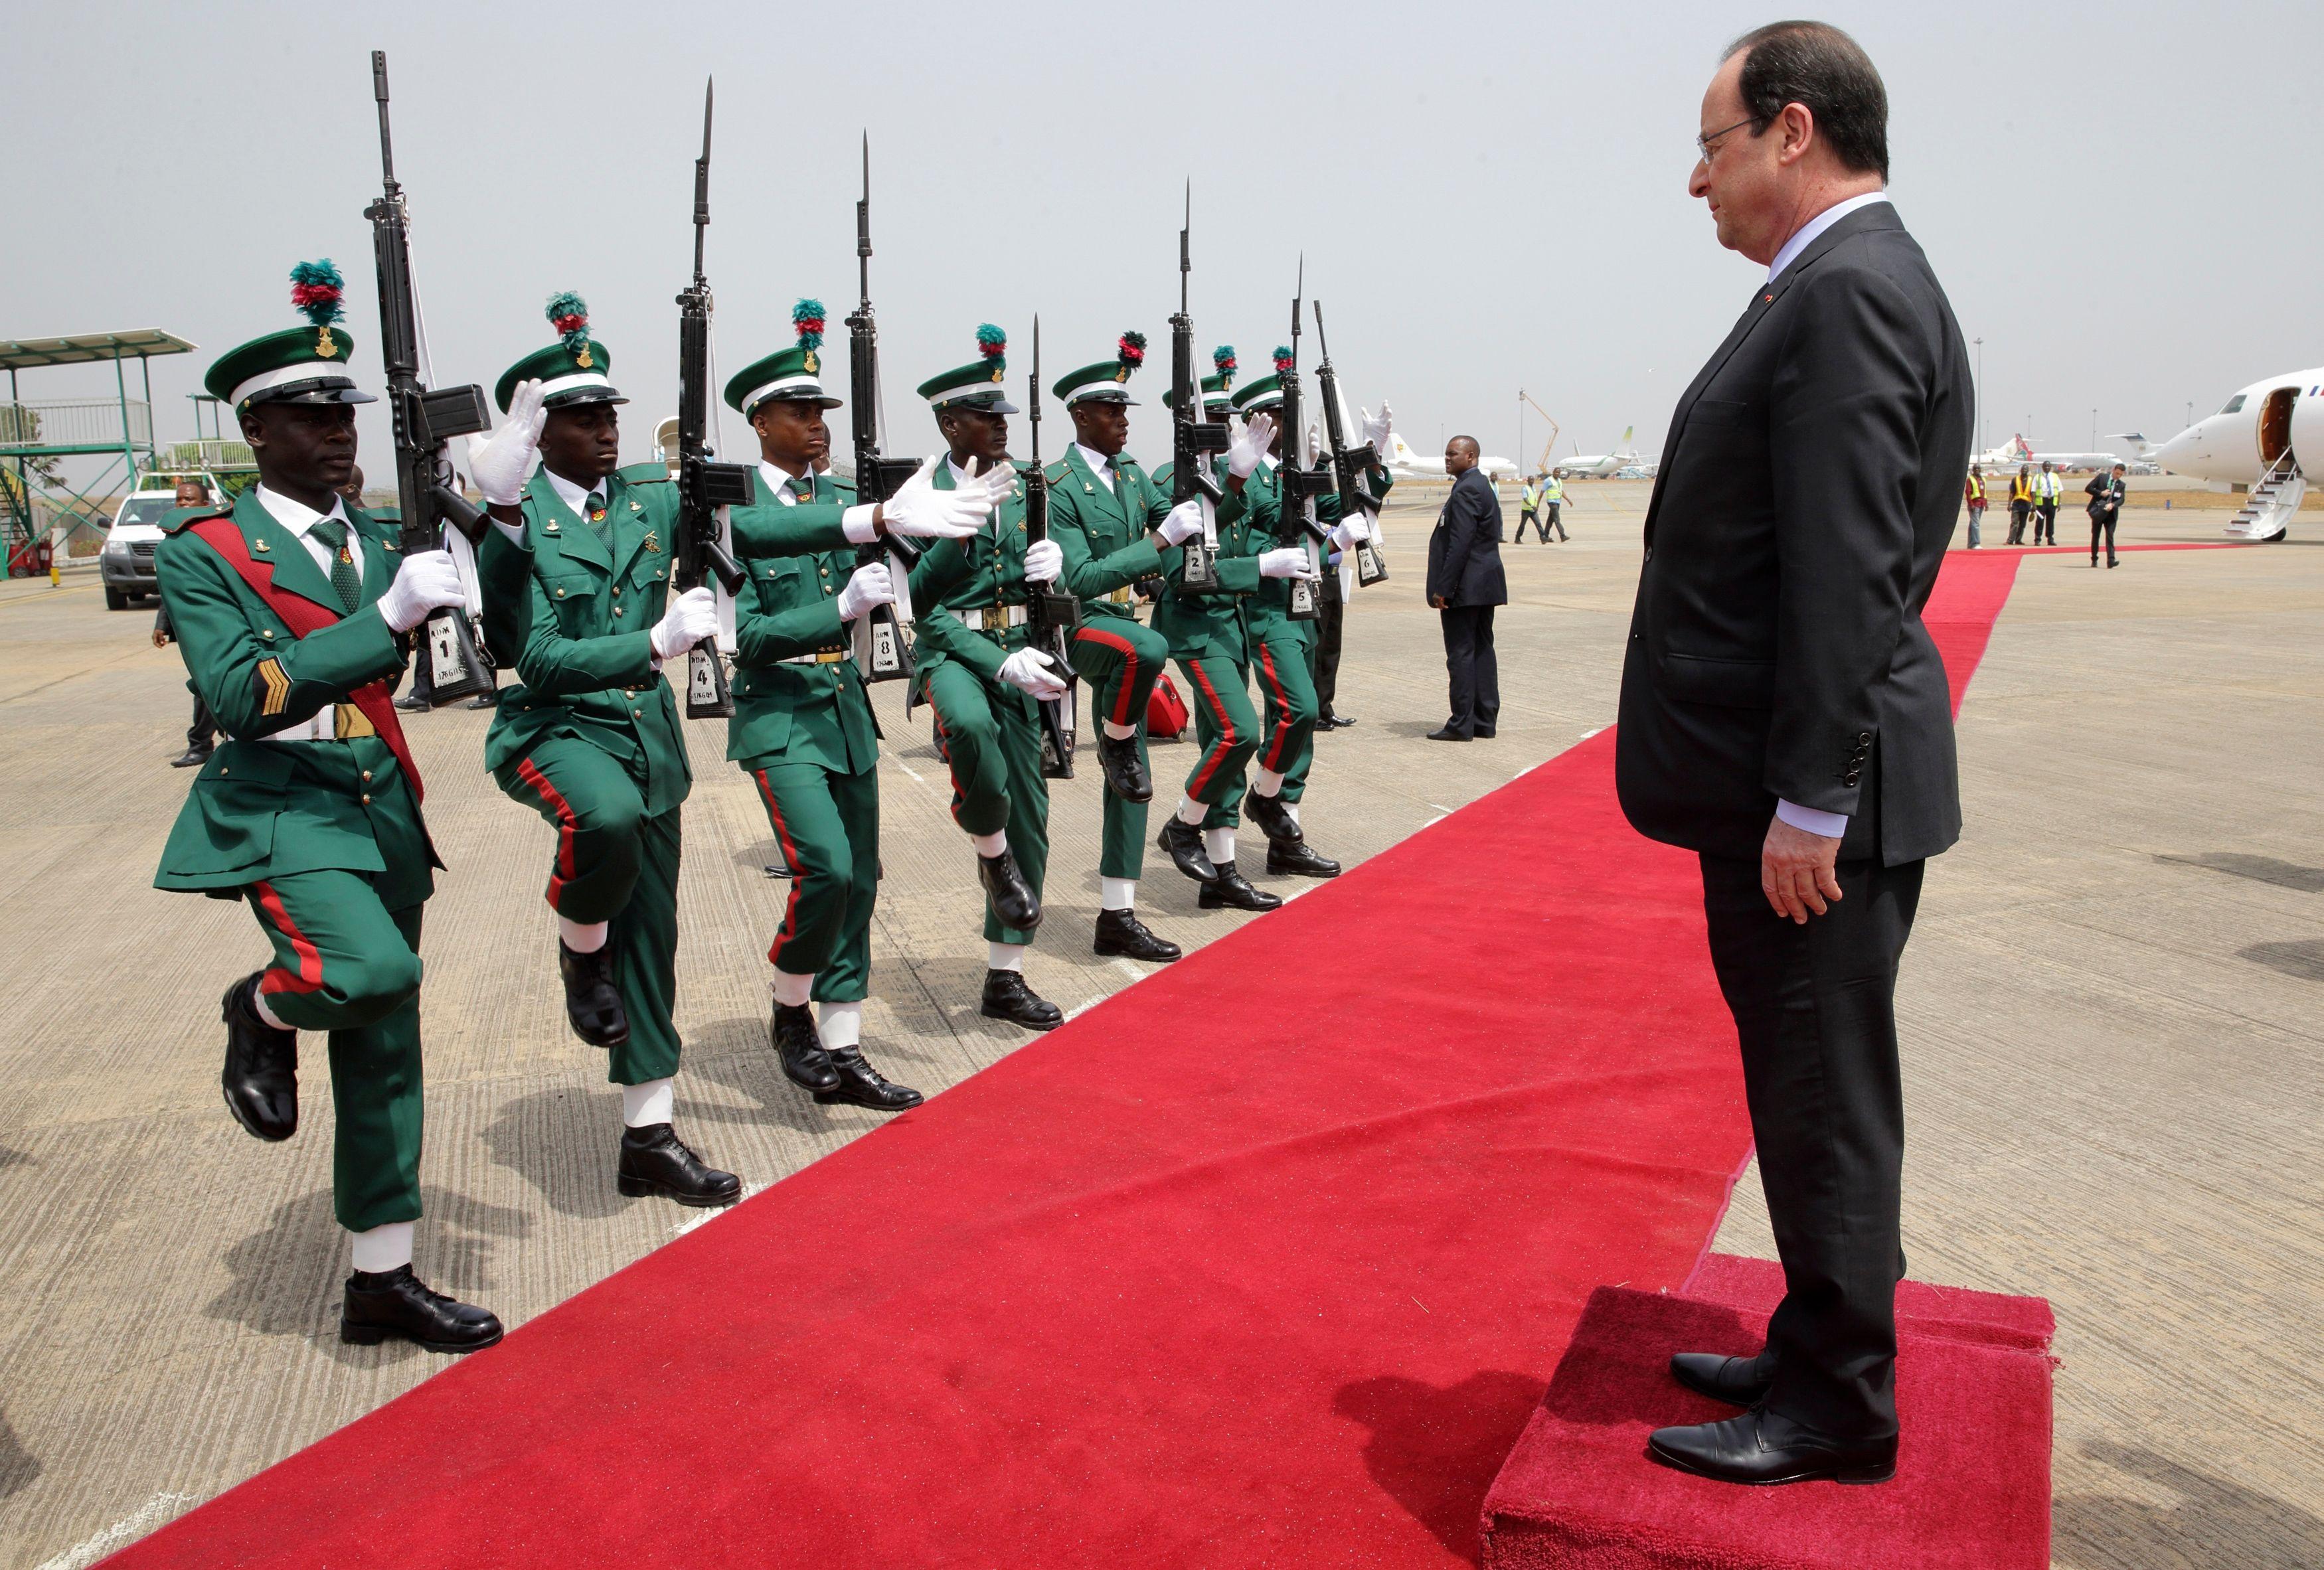 François Hollande en visite au Nigéria.